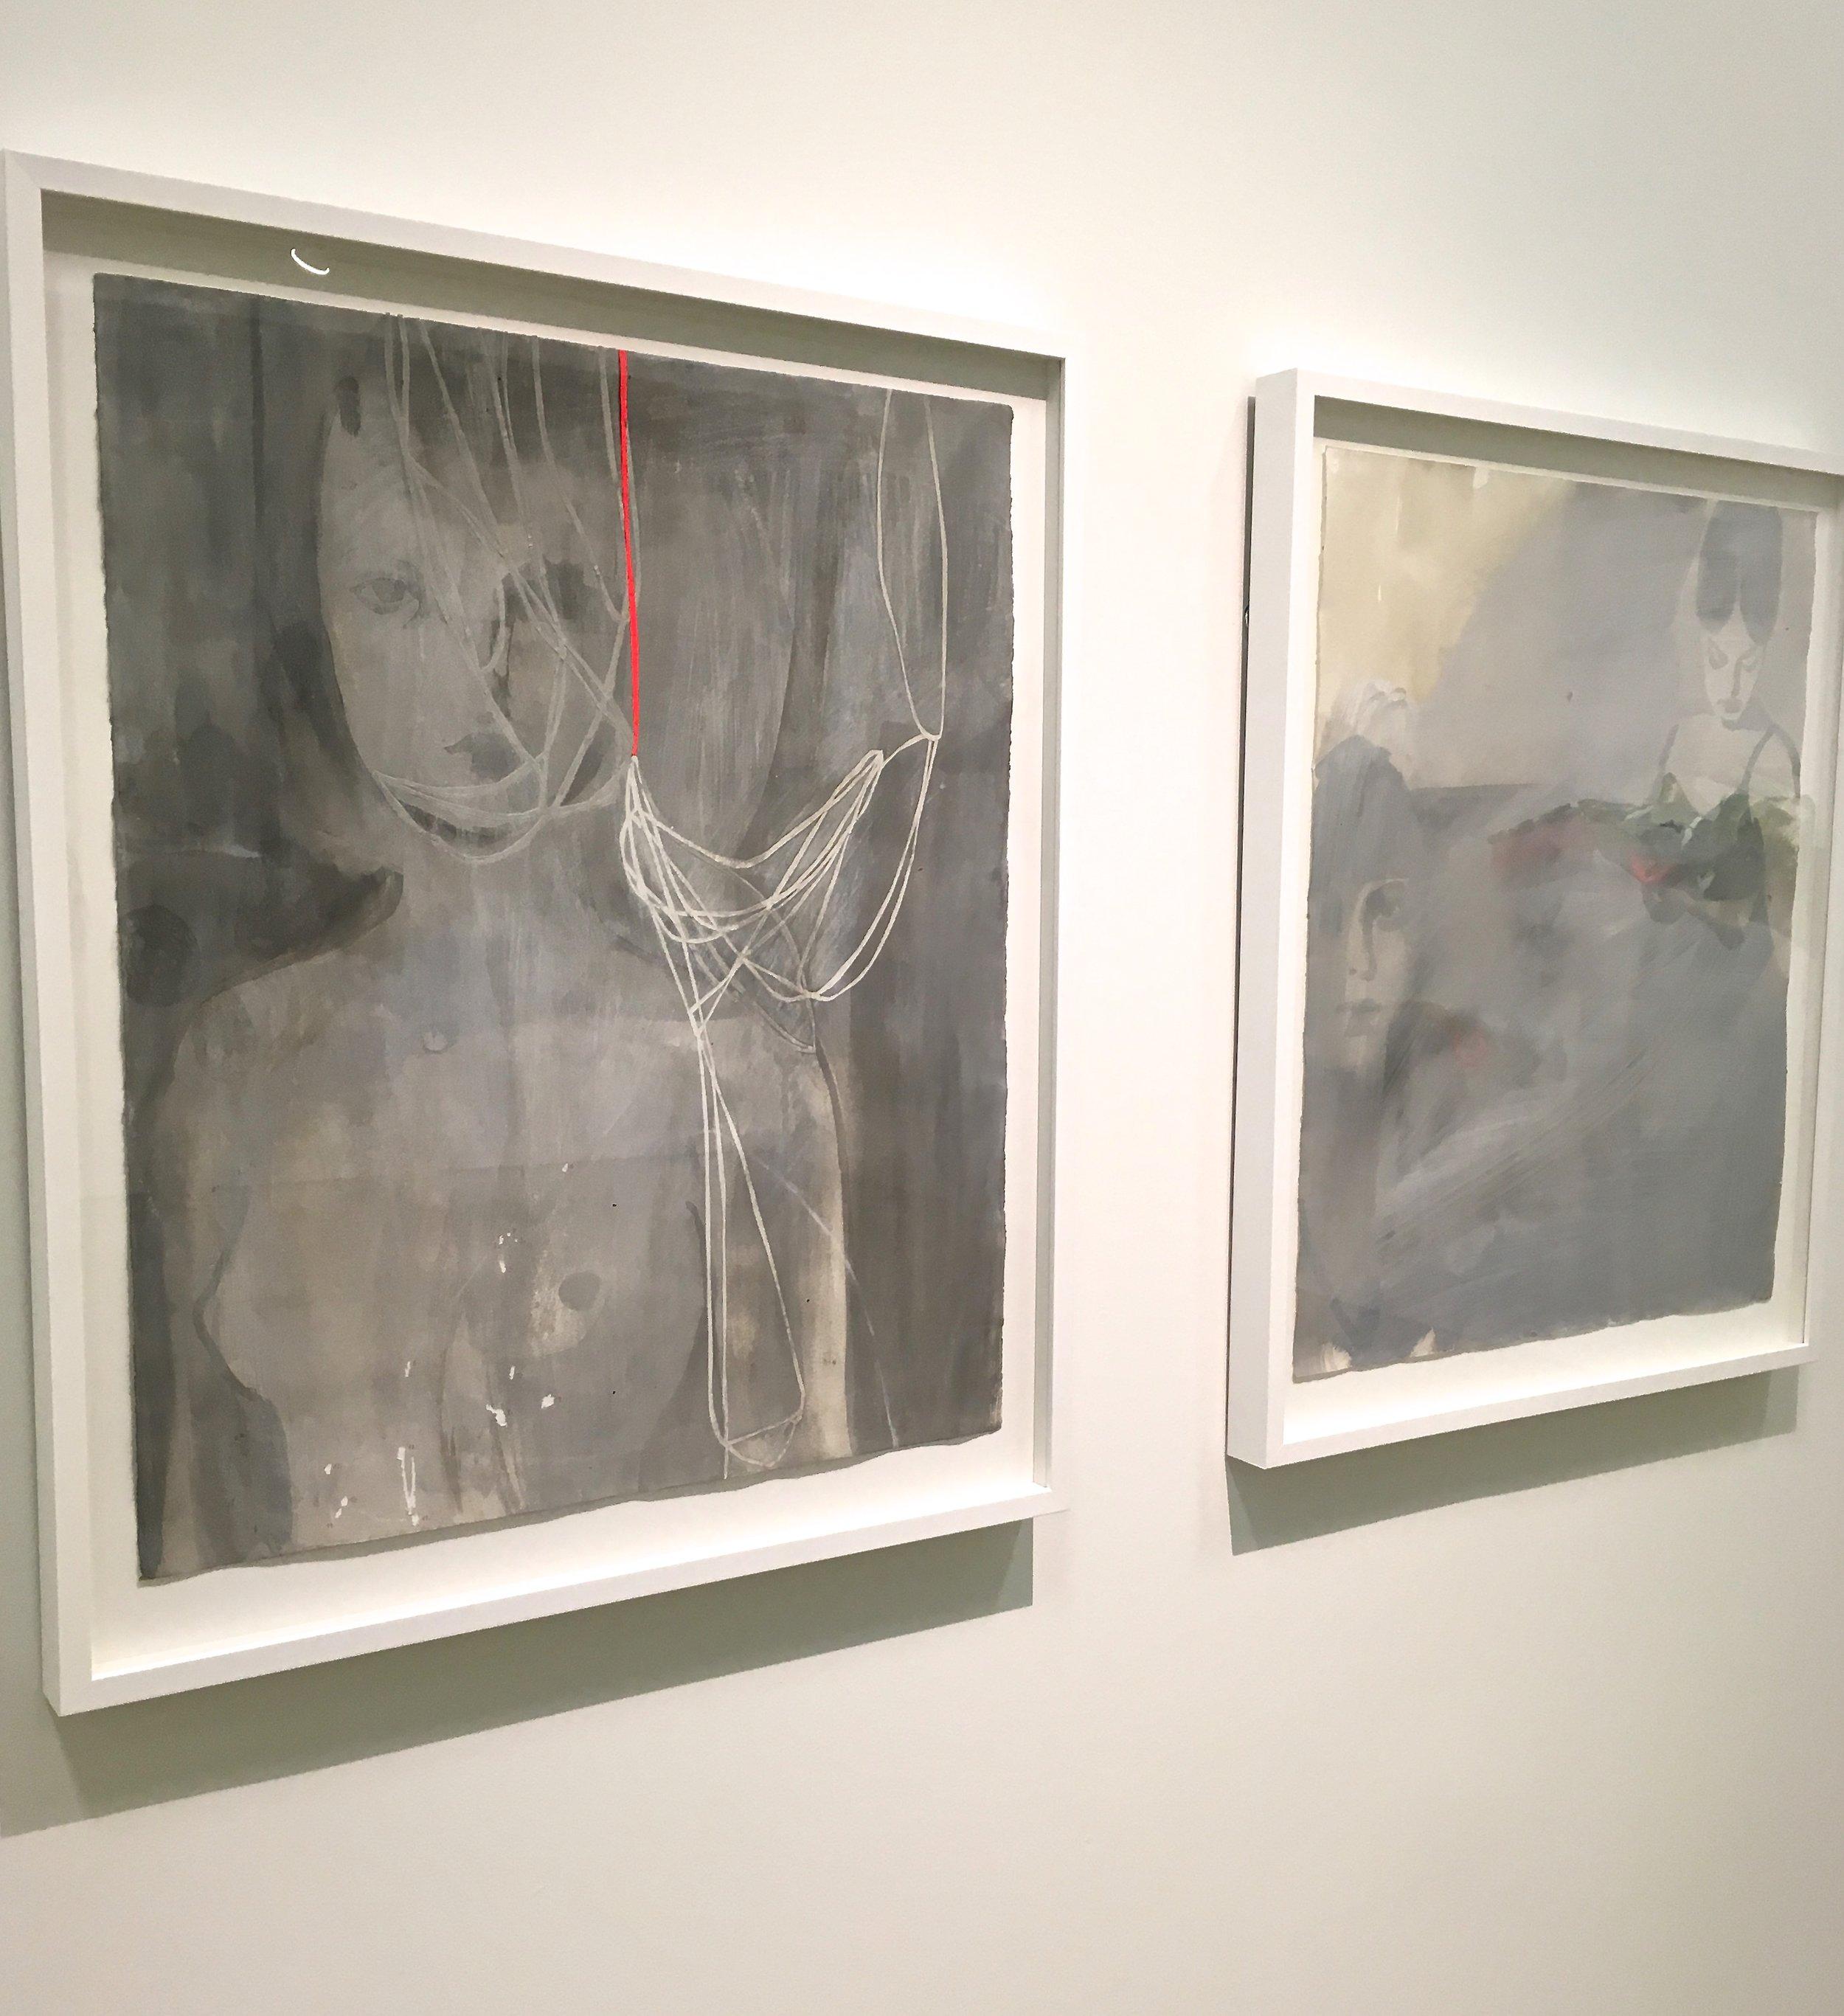 A pair of Tina Berning's Acrylic on Paper pieces.